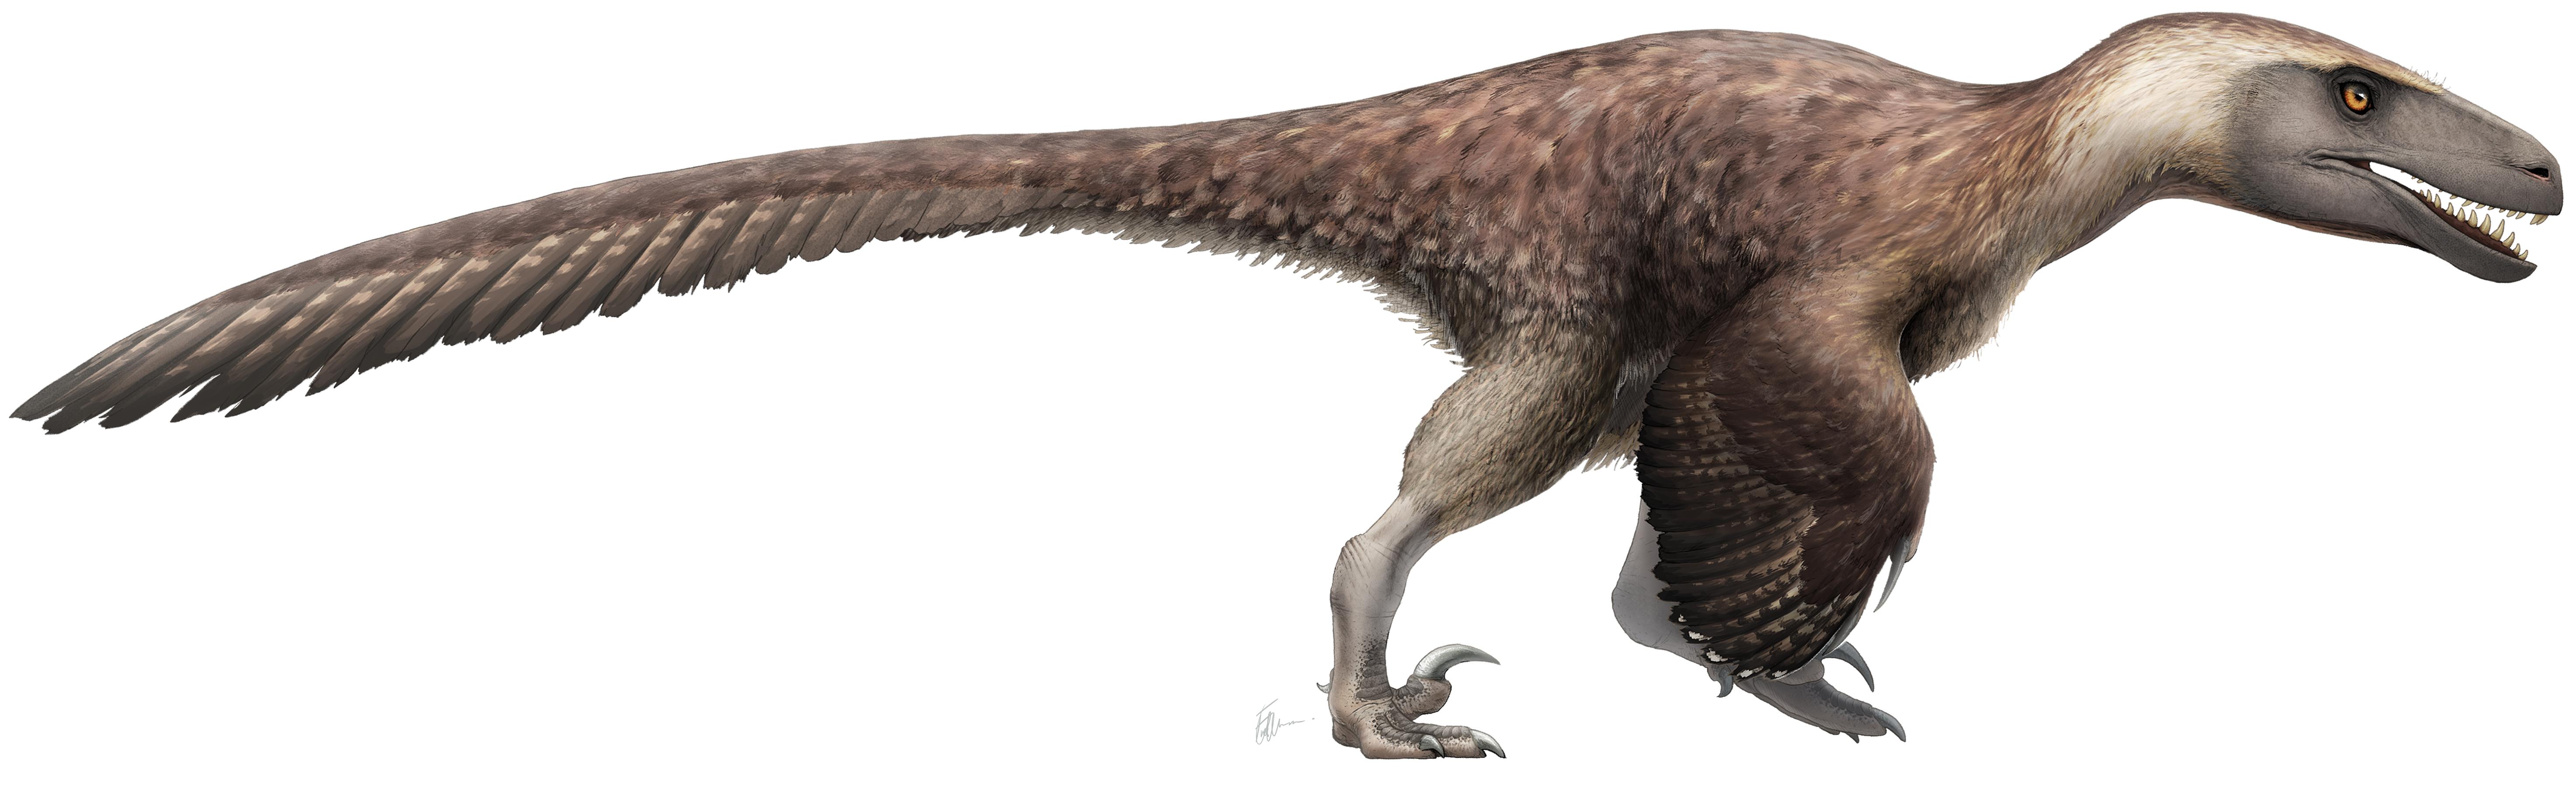 File:Utahraptor Restoration (flipped).png - Wikimedia Commons